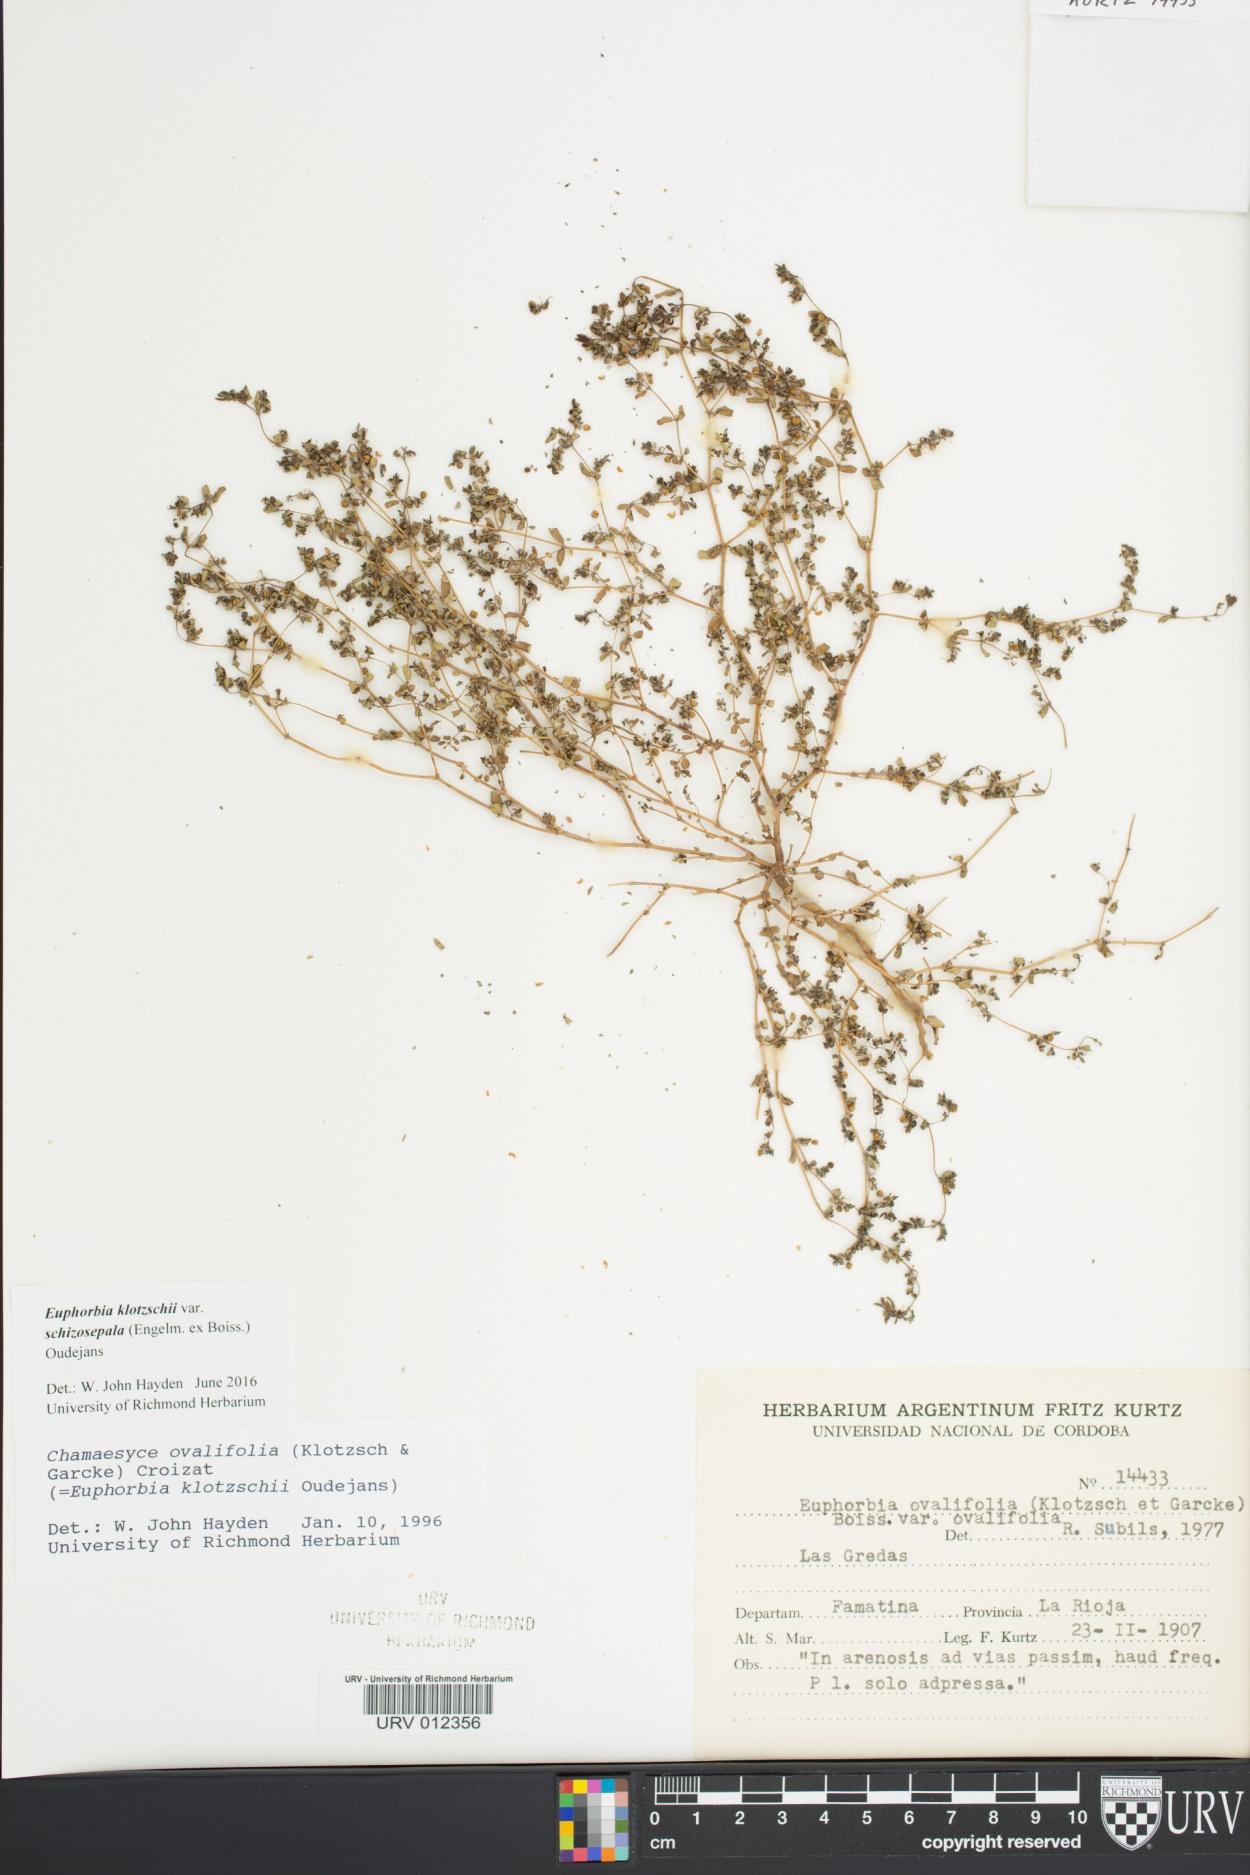 Euphorbia klotzschii image